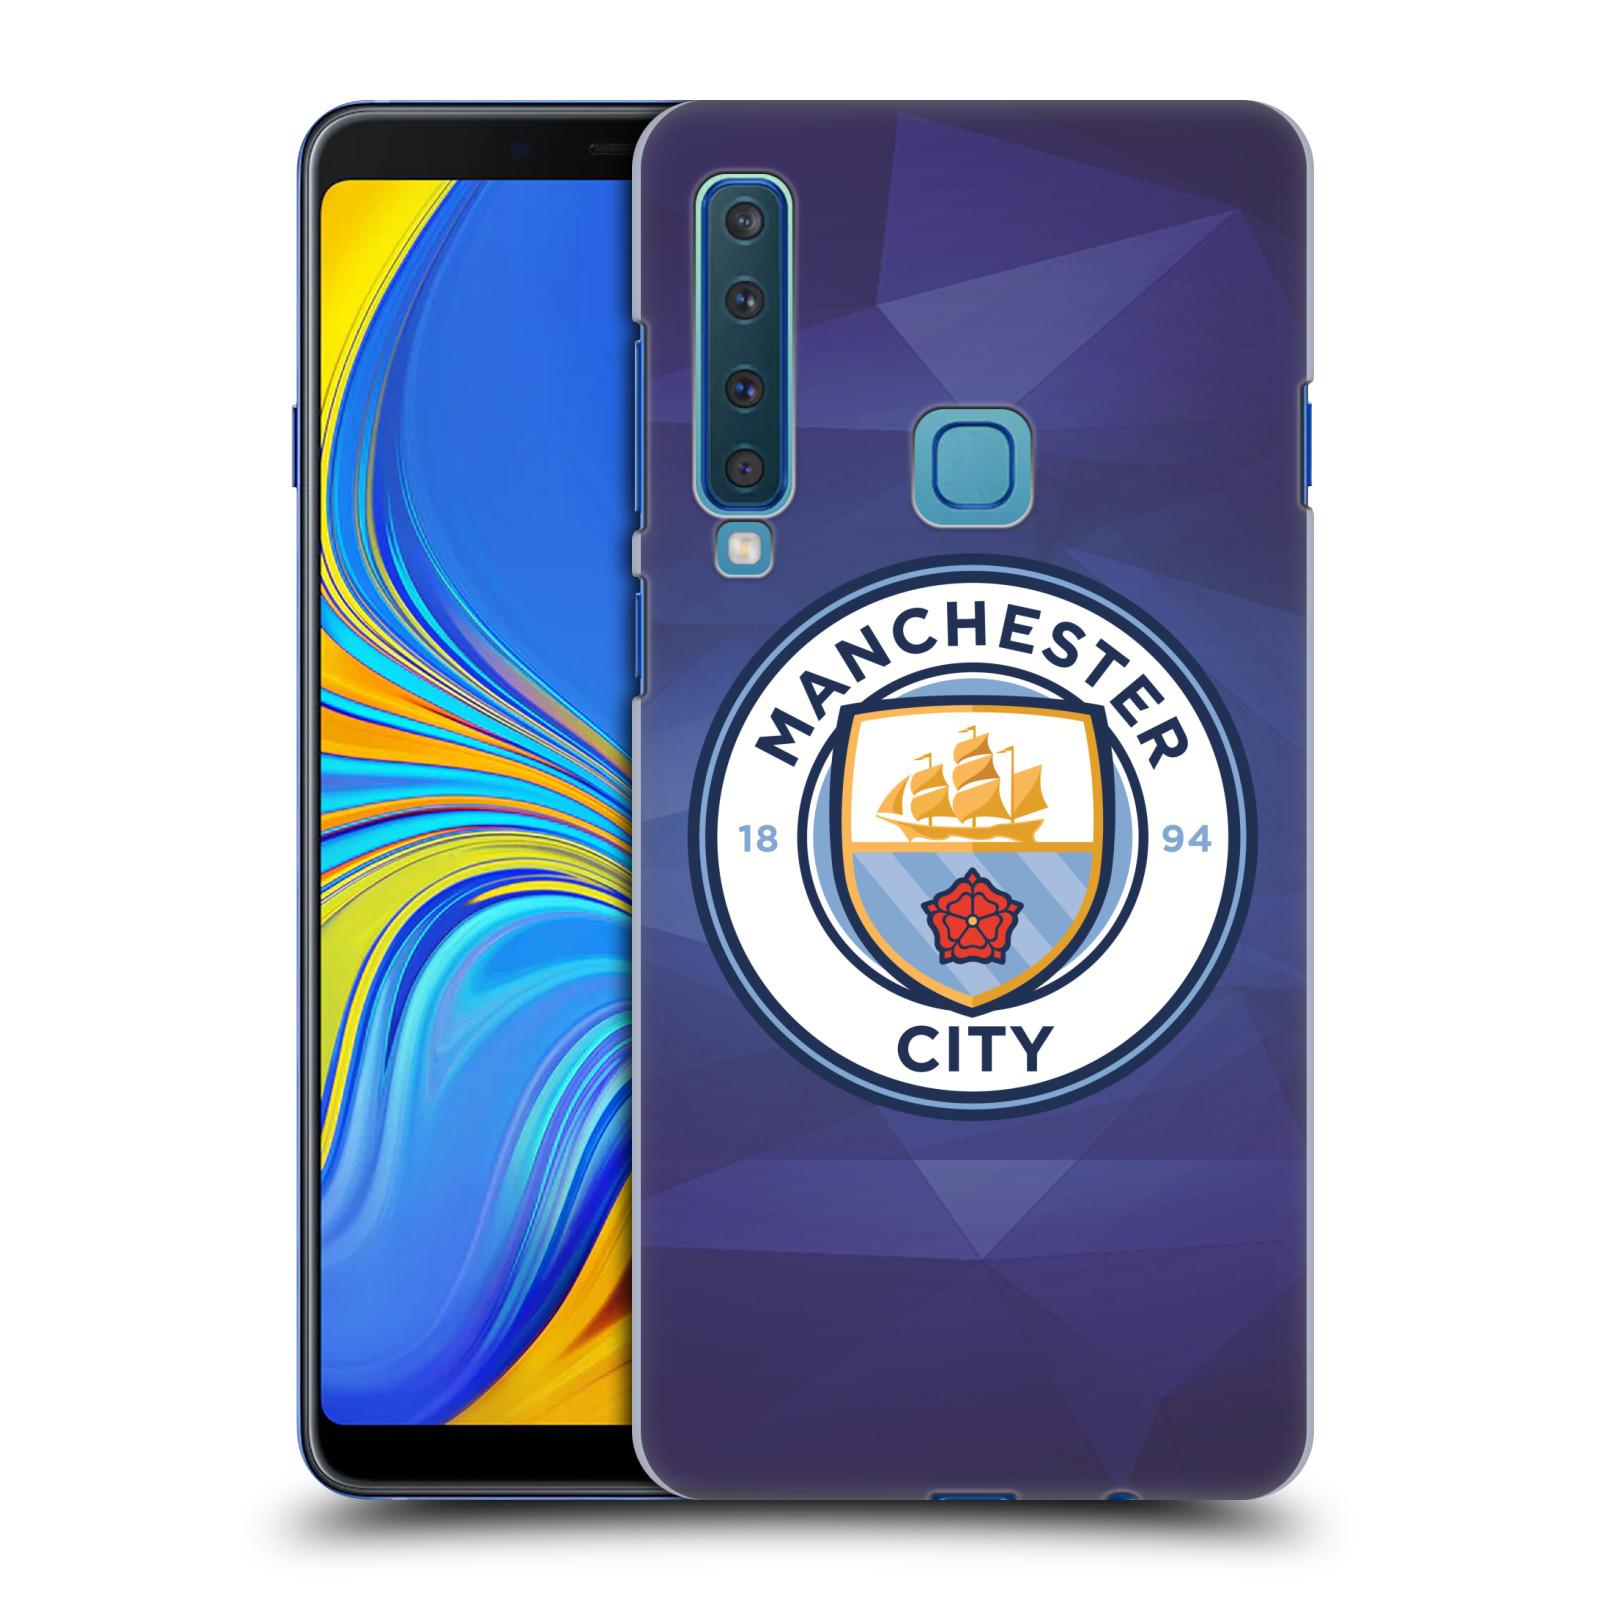 Plastové pouzdro na mobil Samsung Galaxy A9 (2018) - Head Case - Manchester City FC - Modré nové logo